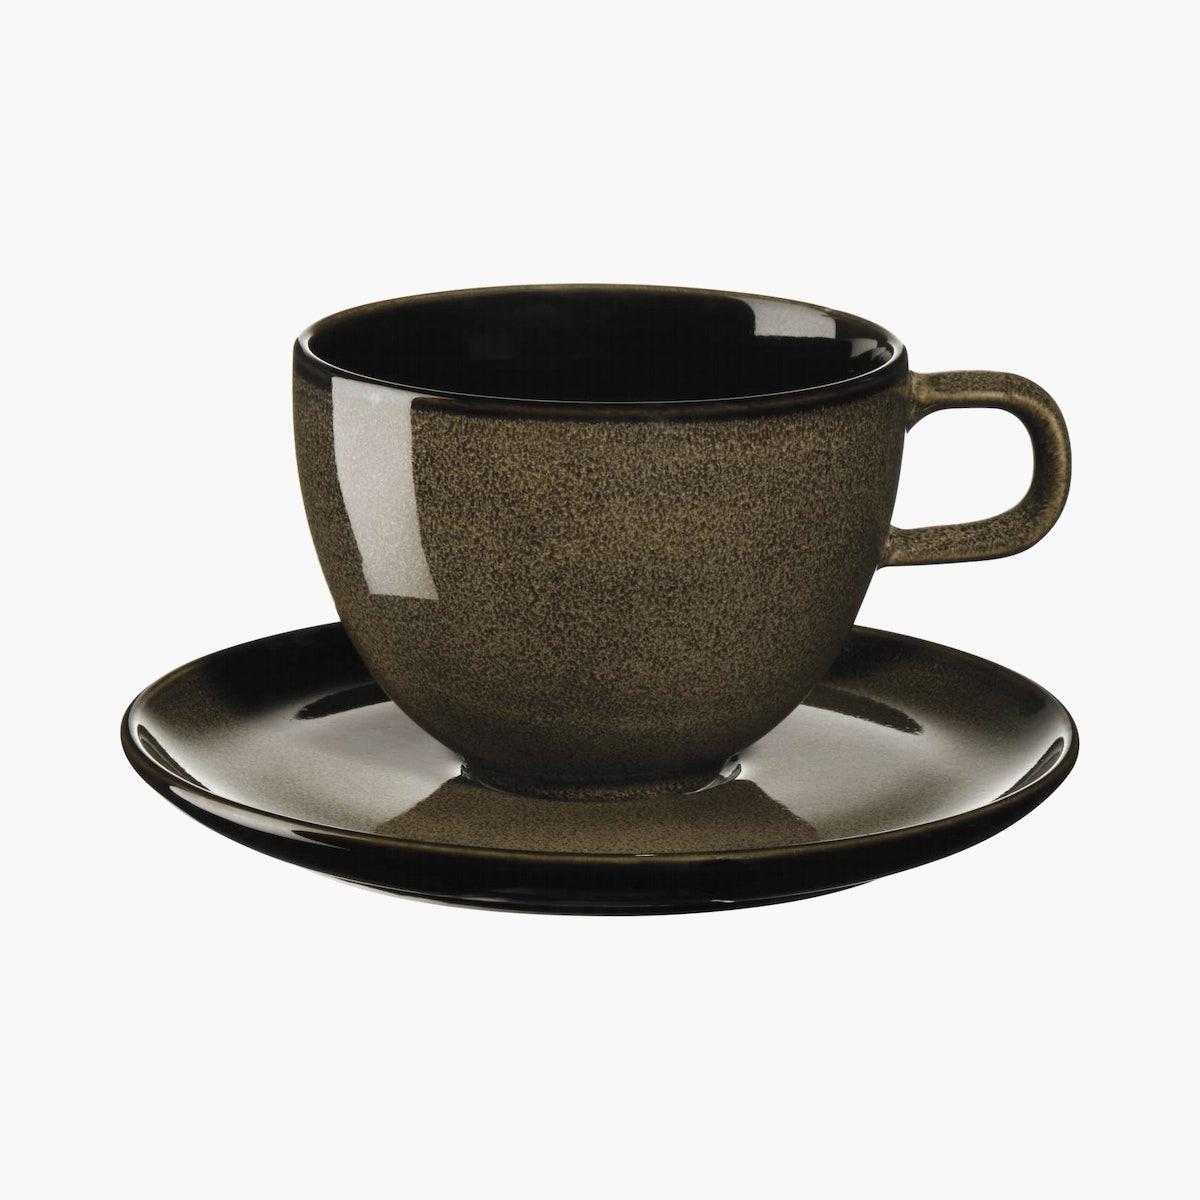 Kolibri Coffee Cup with Saucer